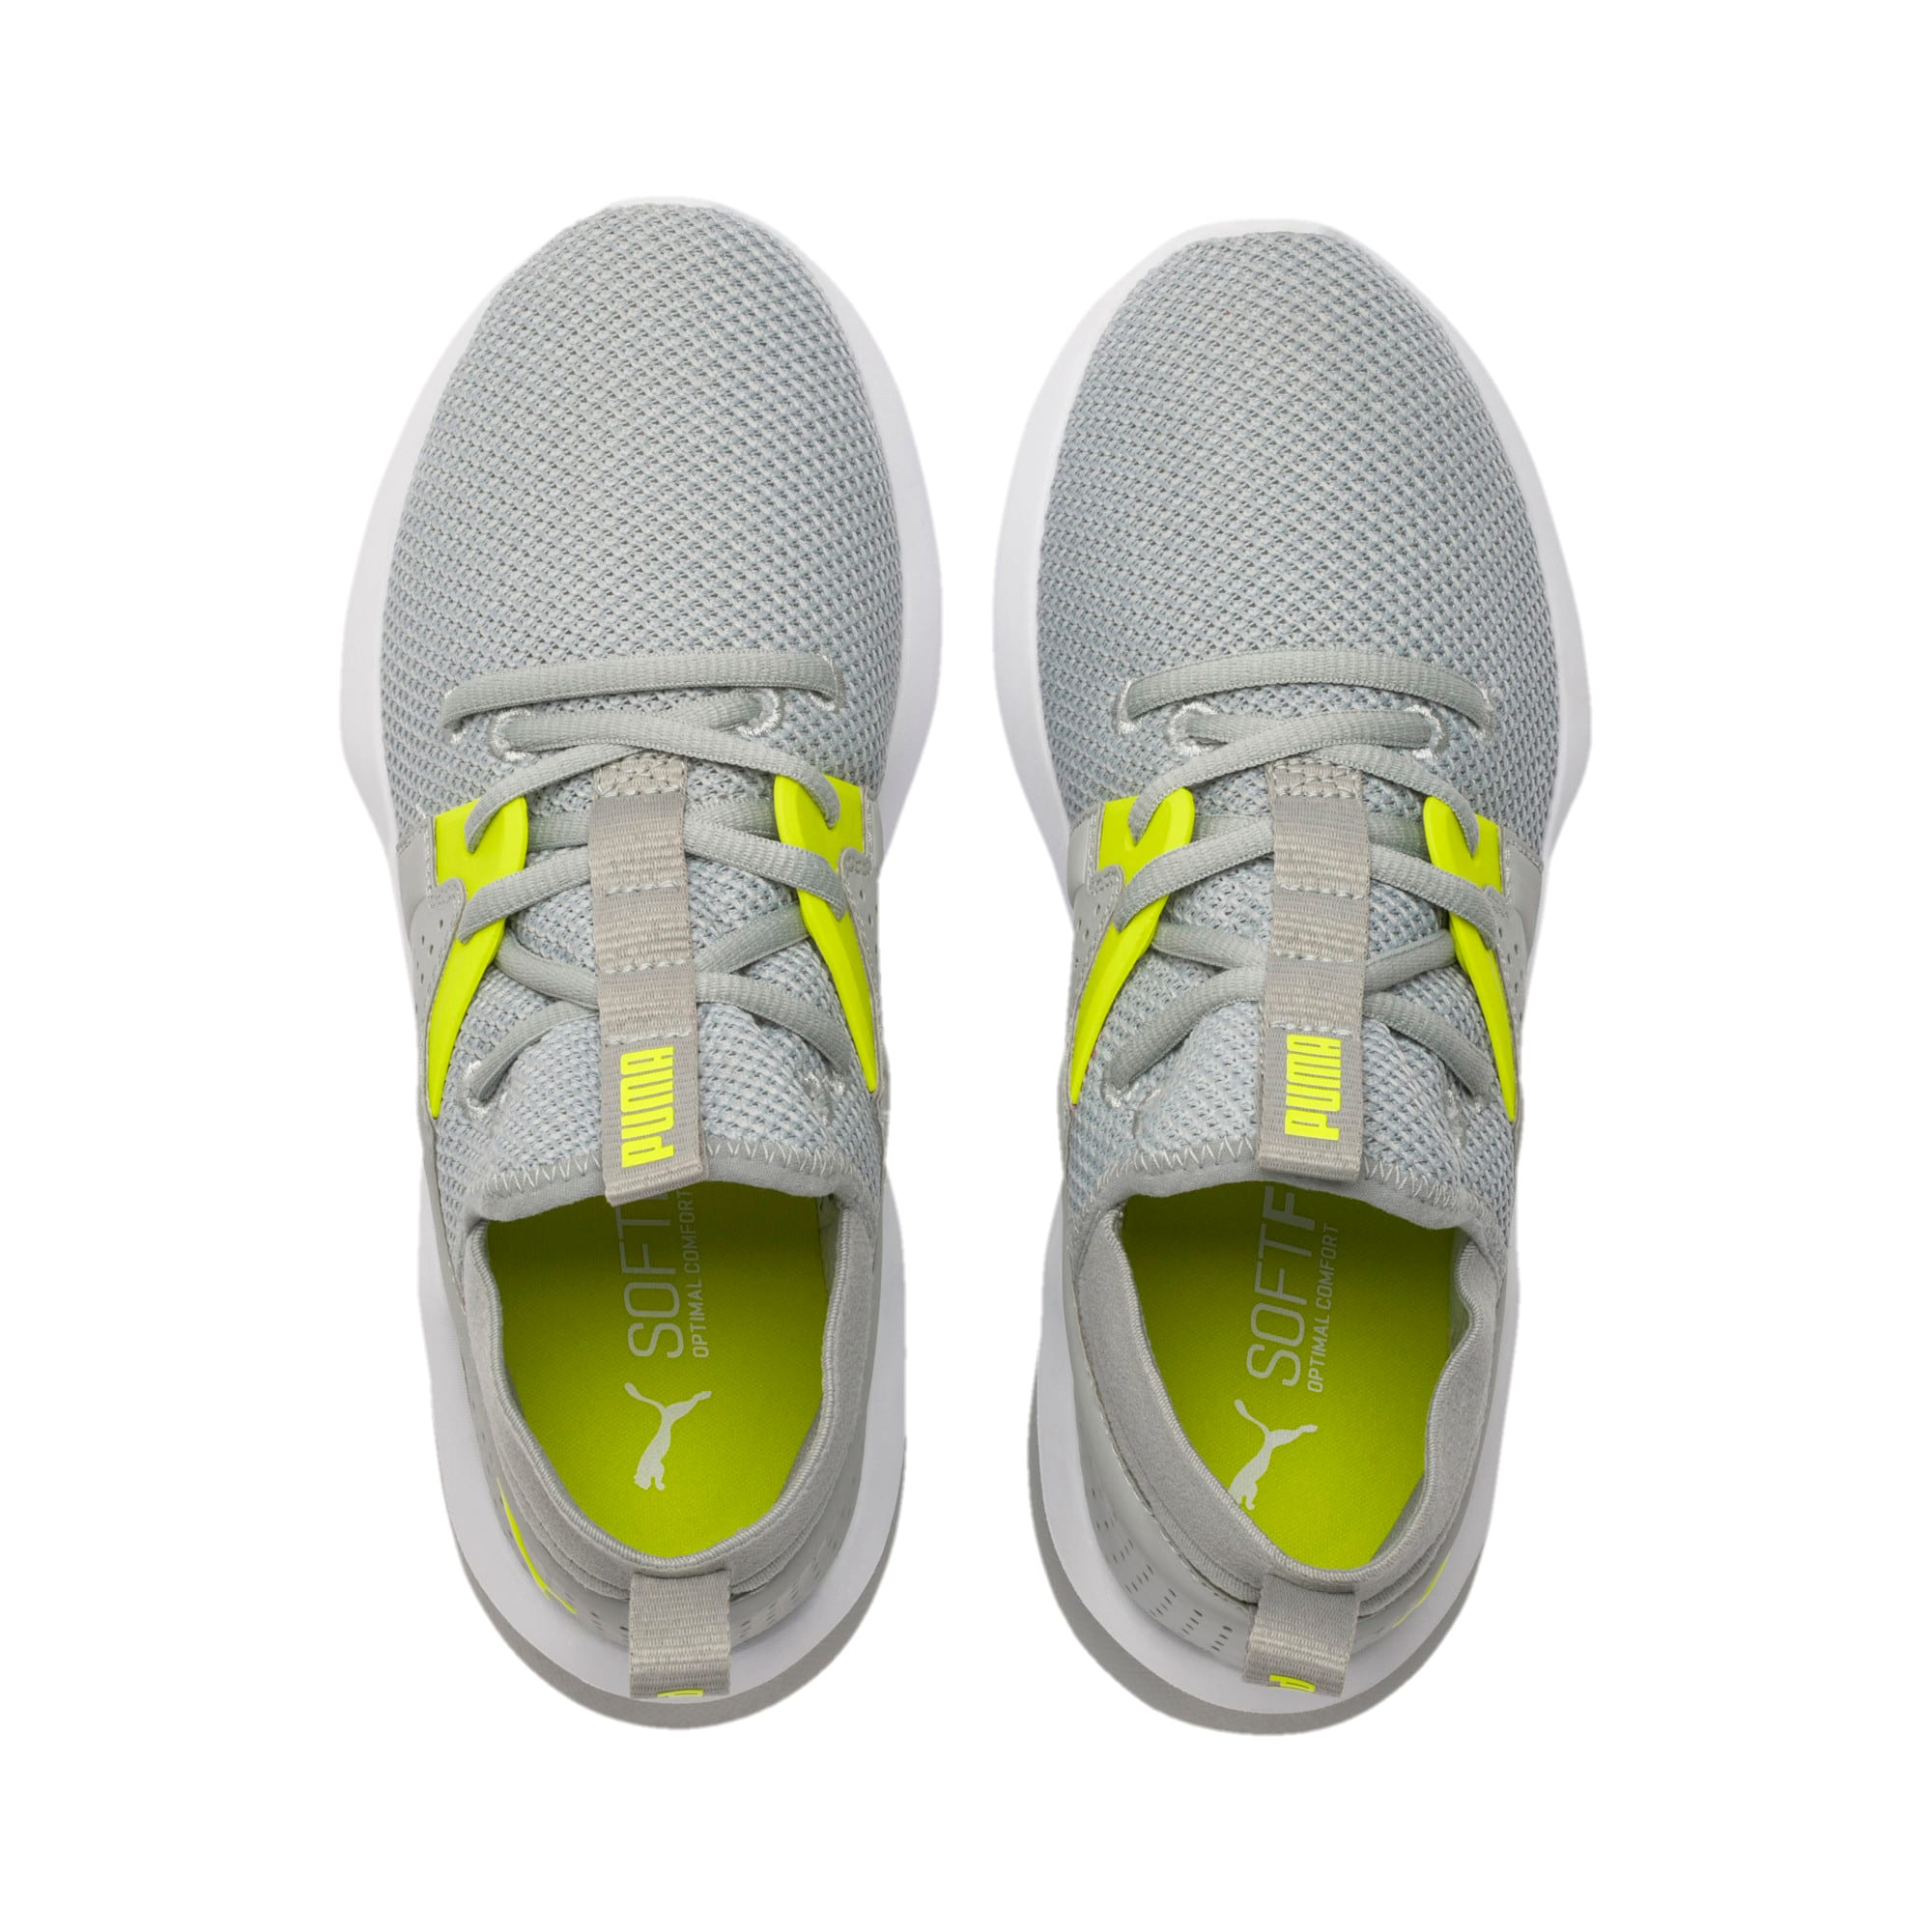 Thumbnail 6 of Emergence Sneakers JR, High Rise-Nrgy Yellow, medium